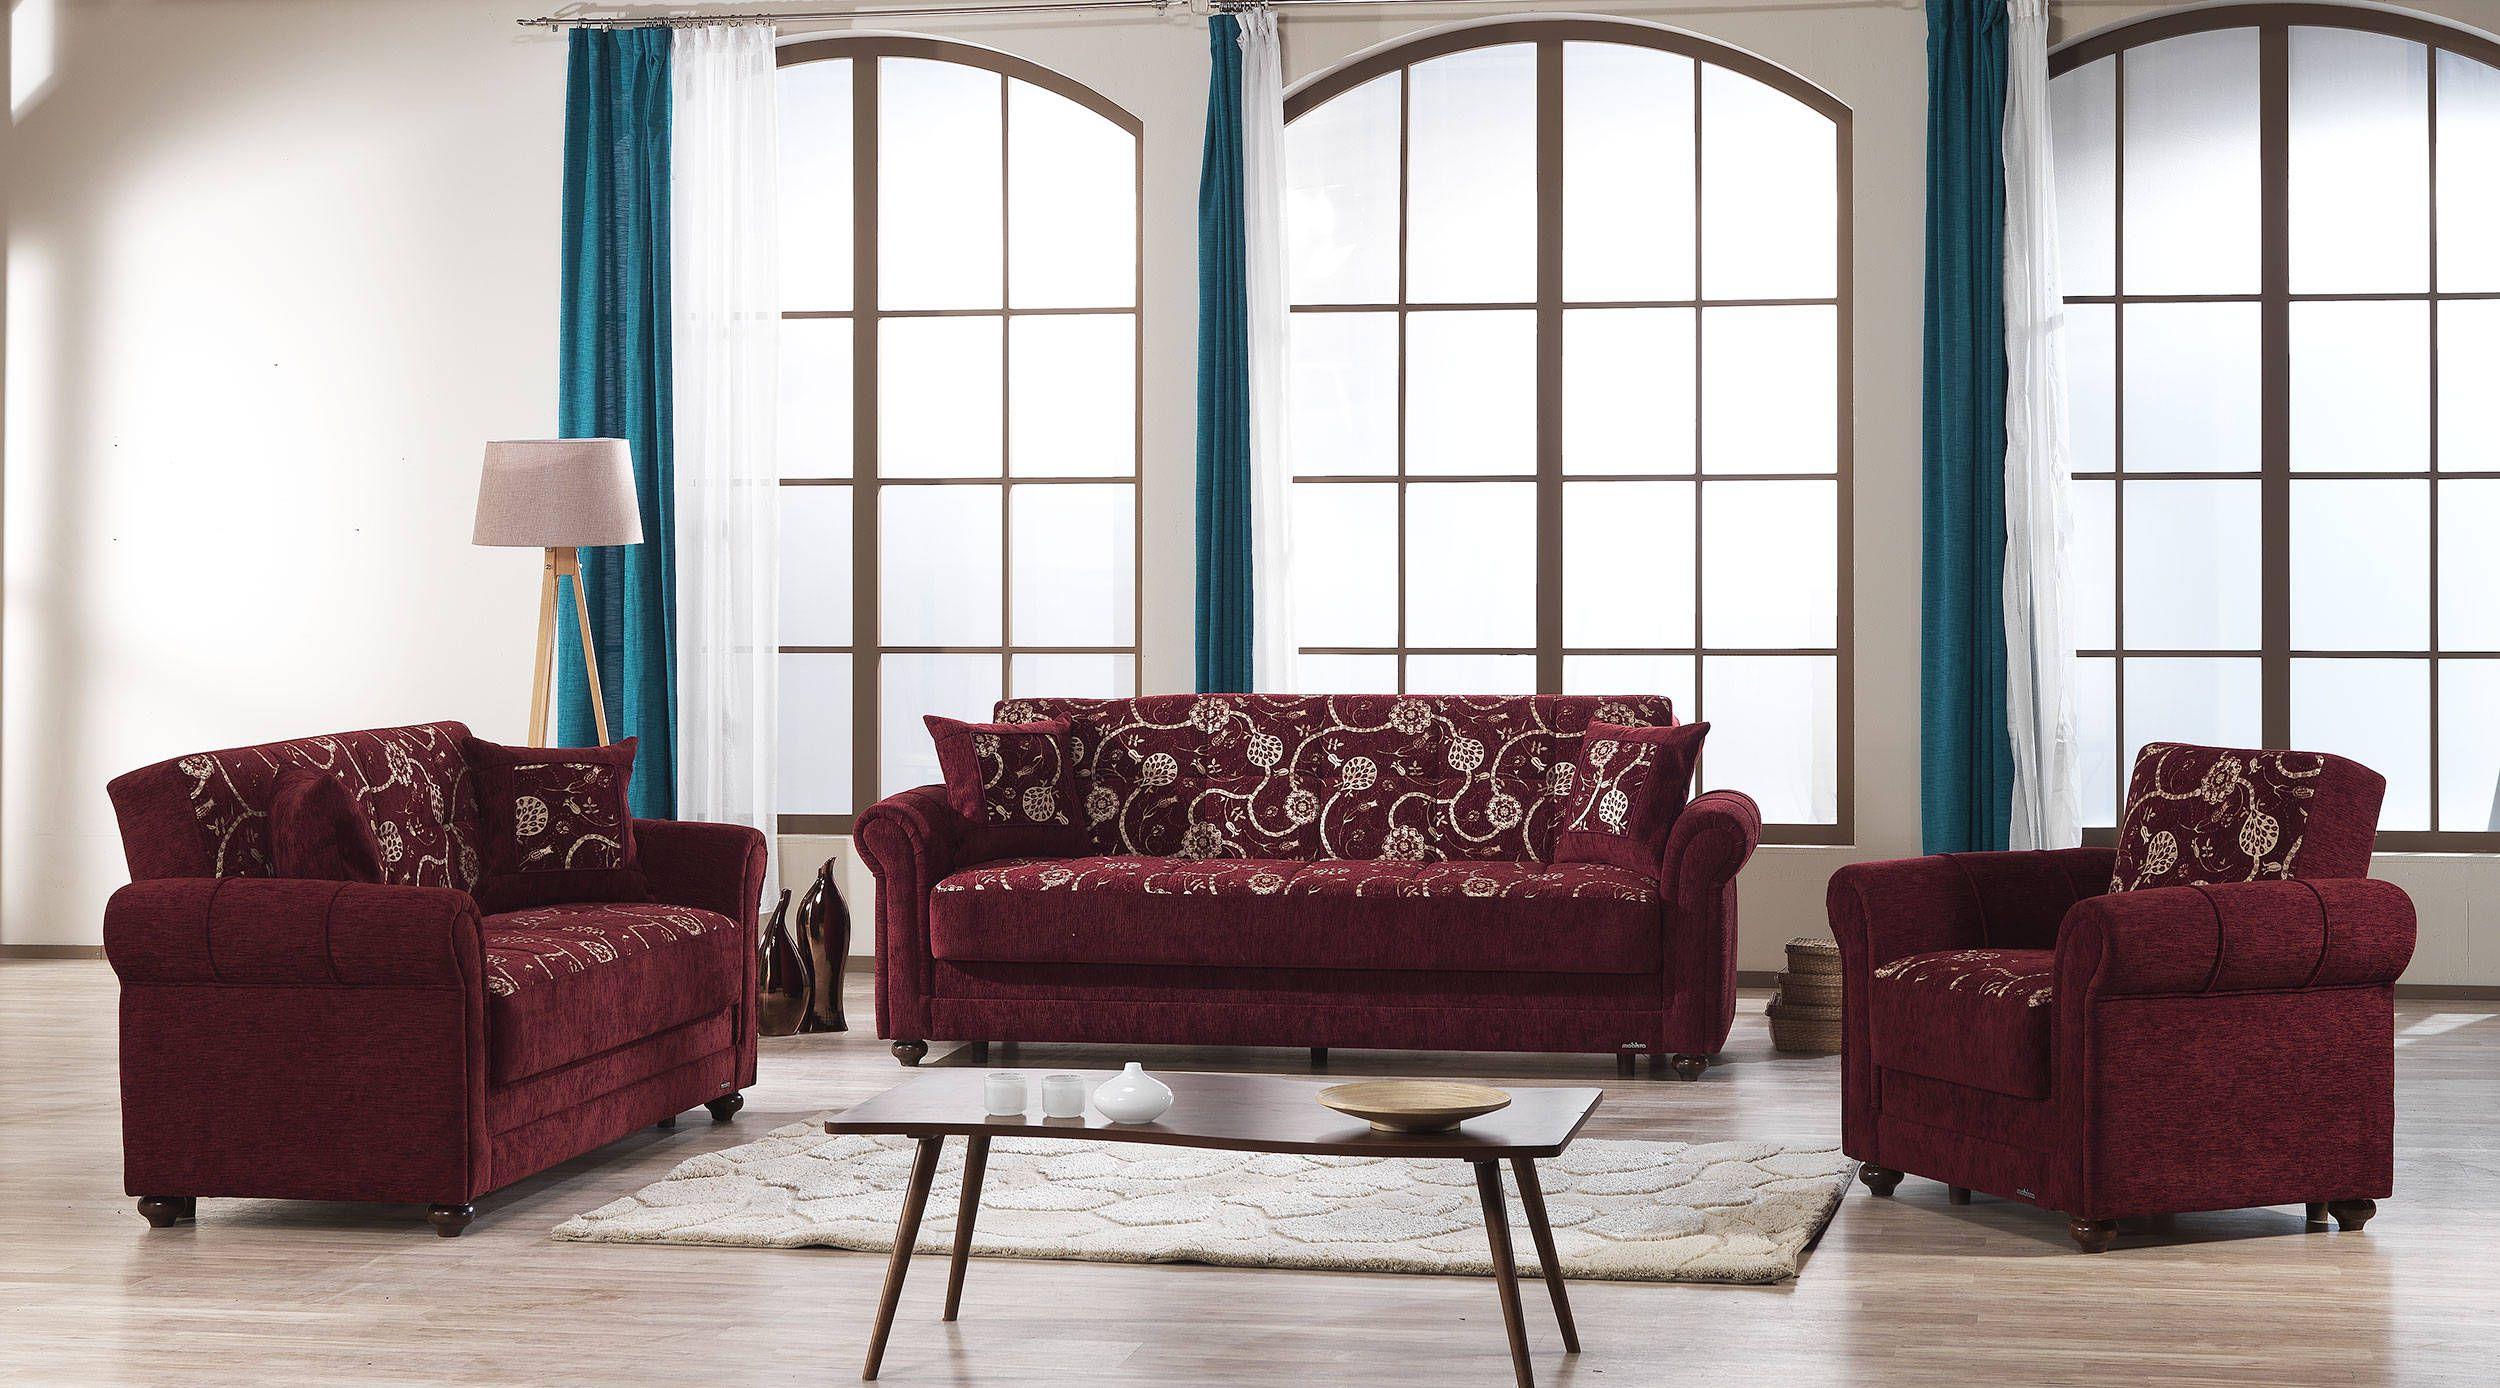 Best Regina Home Burgundy Fabric Mdf Plywood 3Pc Living Room 400 x 300